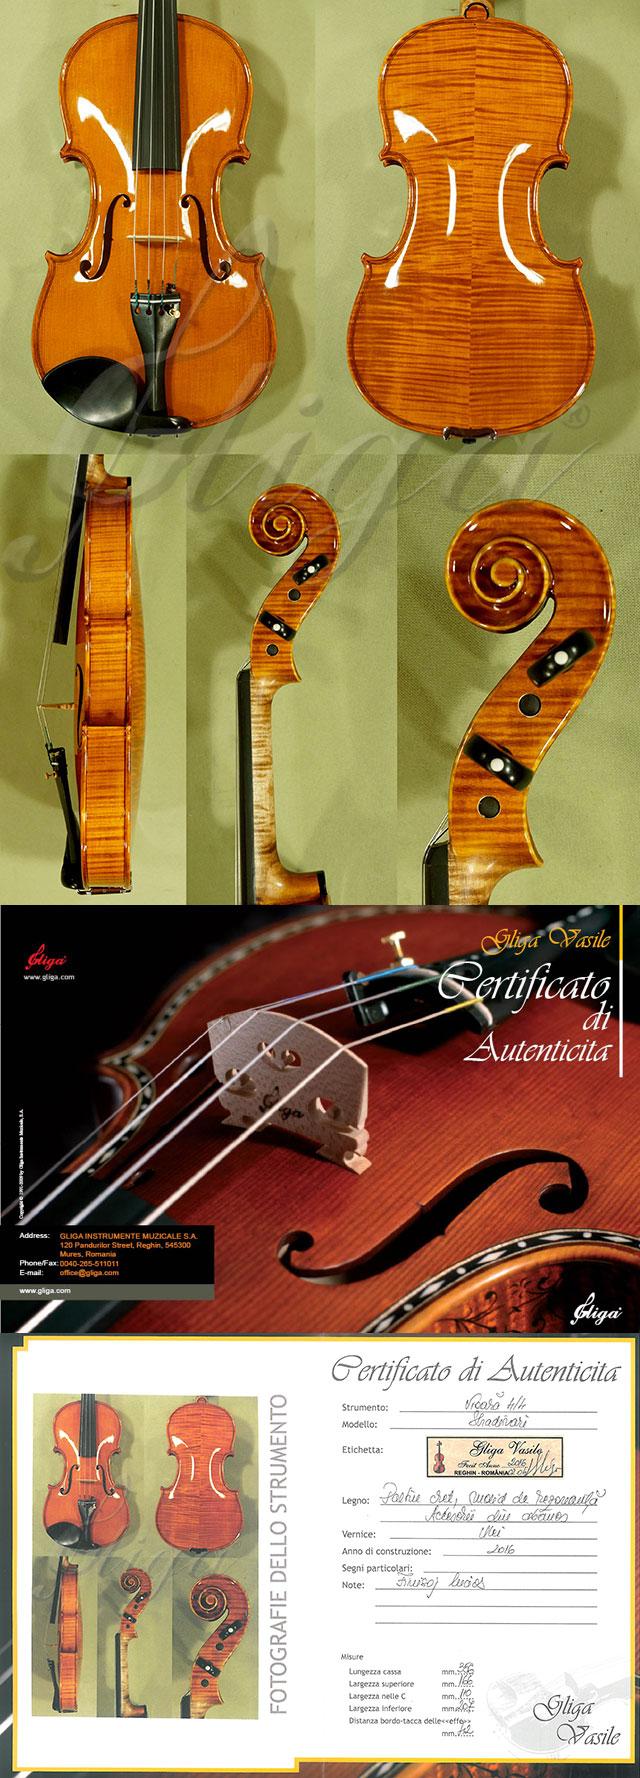 Shiny 4/4 MAESTRO VASILE GLIGA Violin